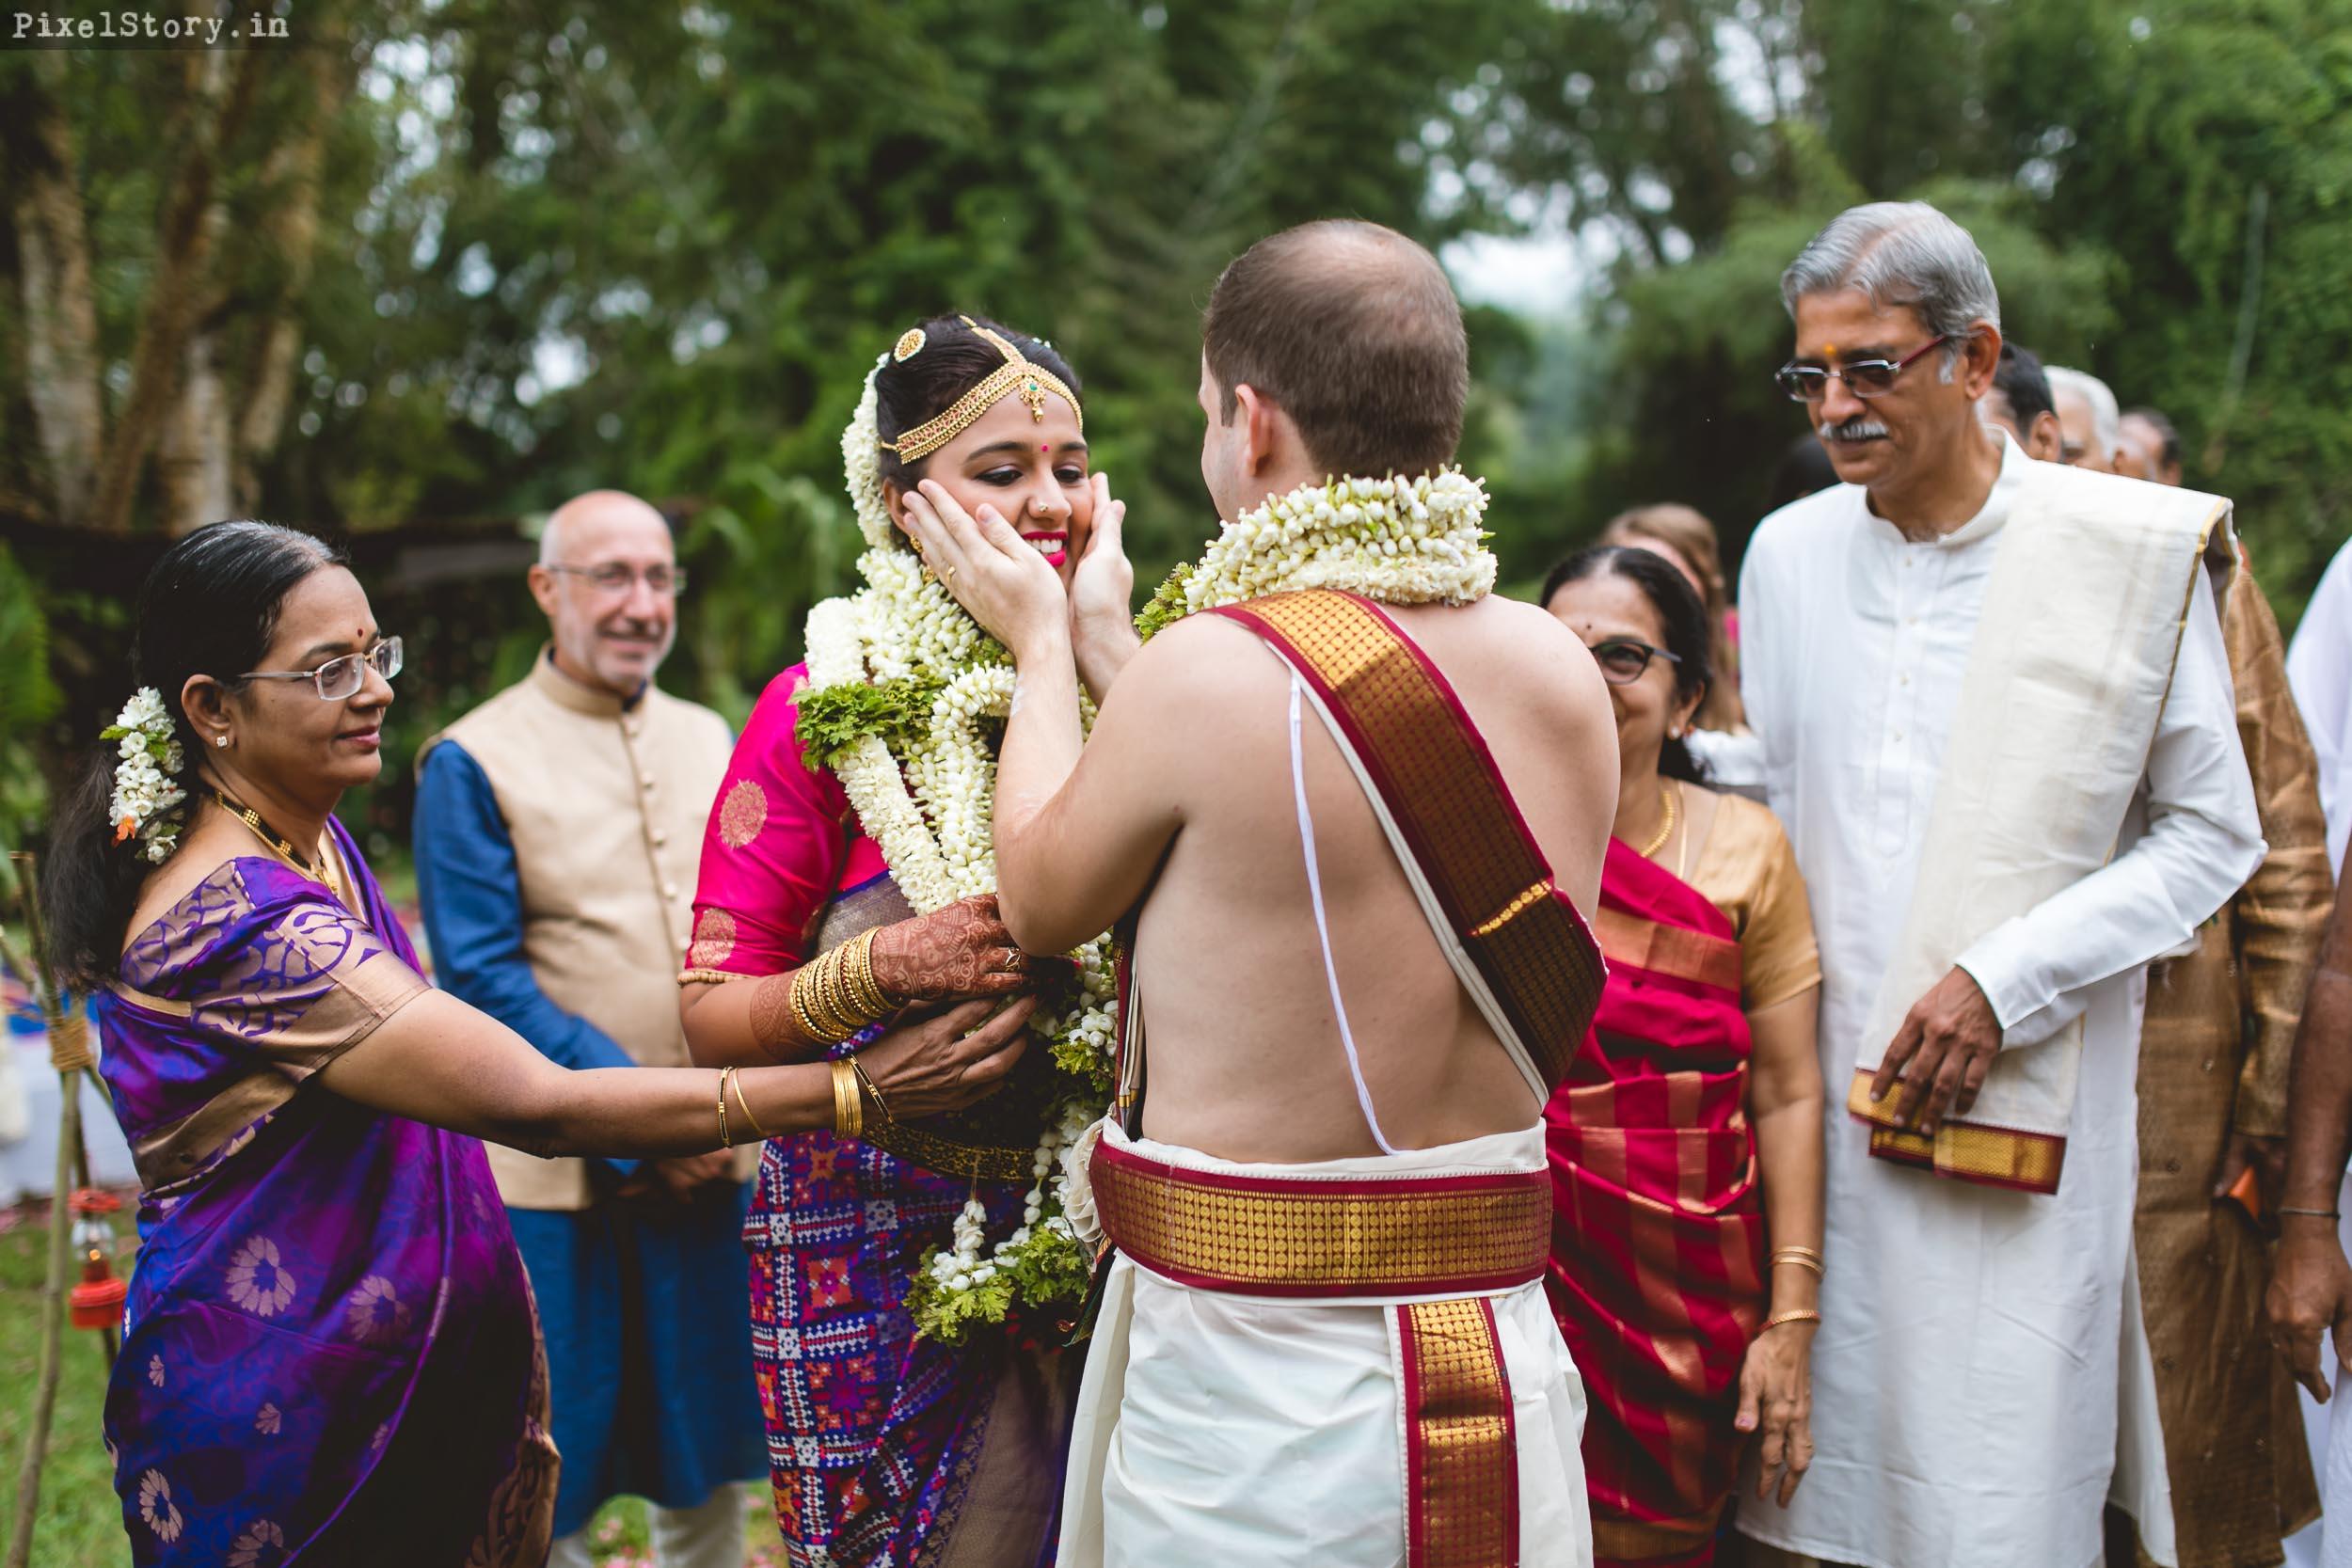 PixelStory-Jungle-Wedding-Photographer-Masinagudi-Indo-French032.jpg